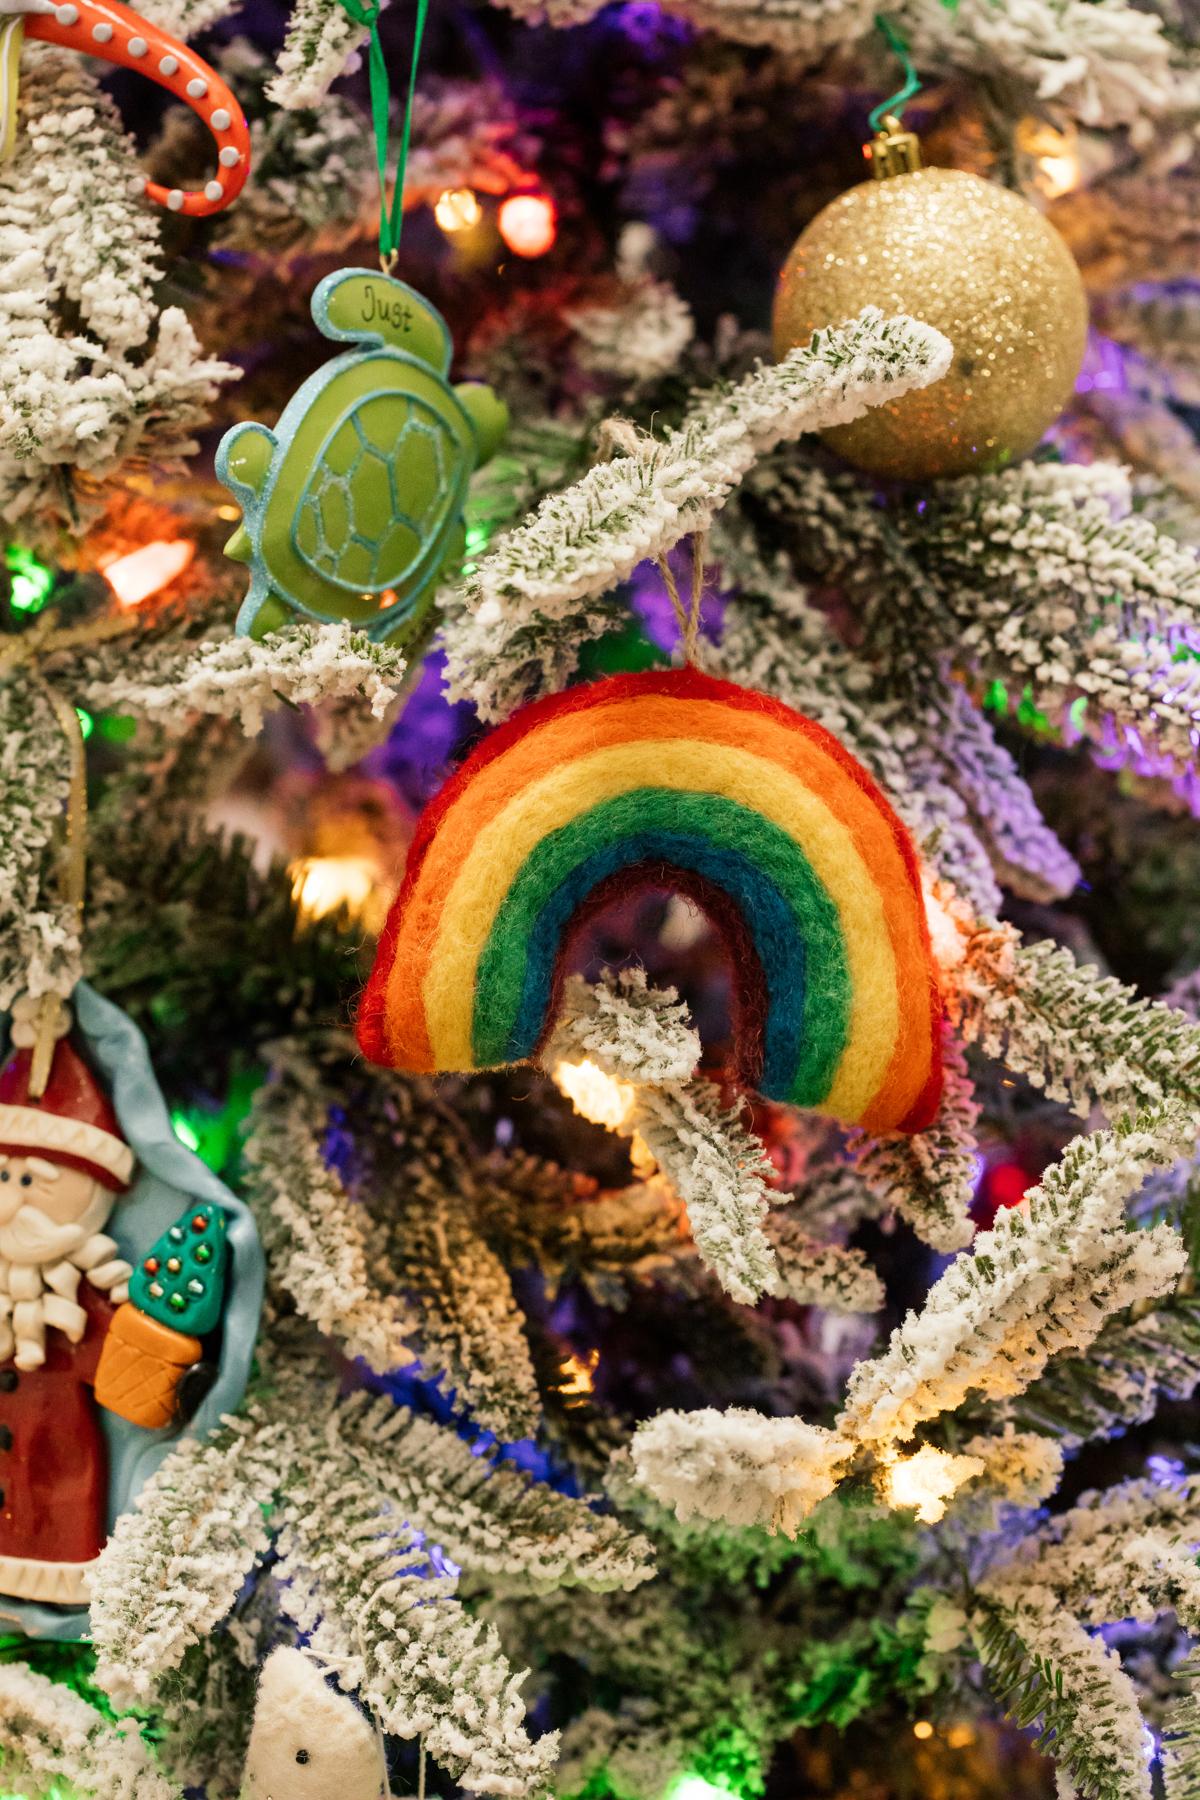 Indoor Holiday decor of lit Christmas tree and felt rainbow ornament